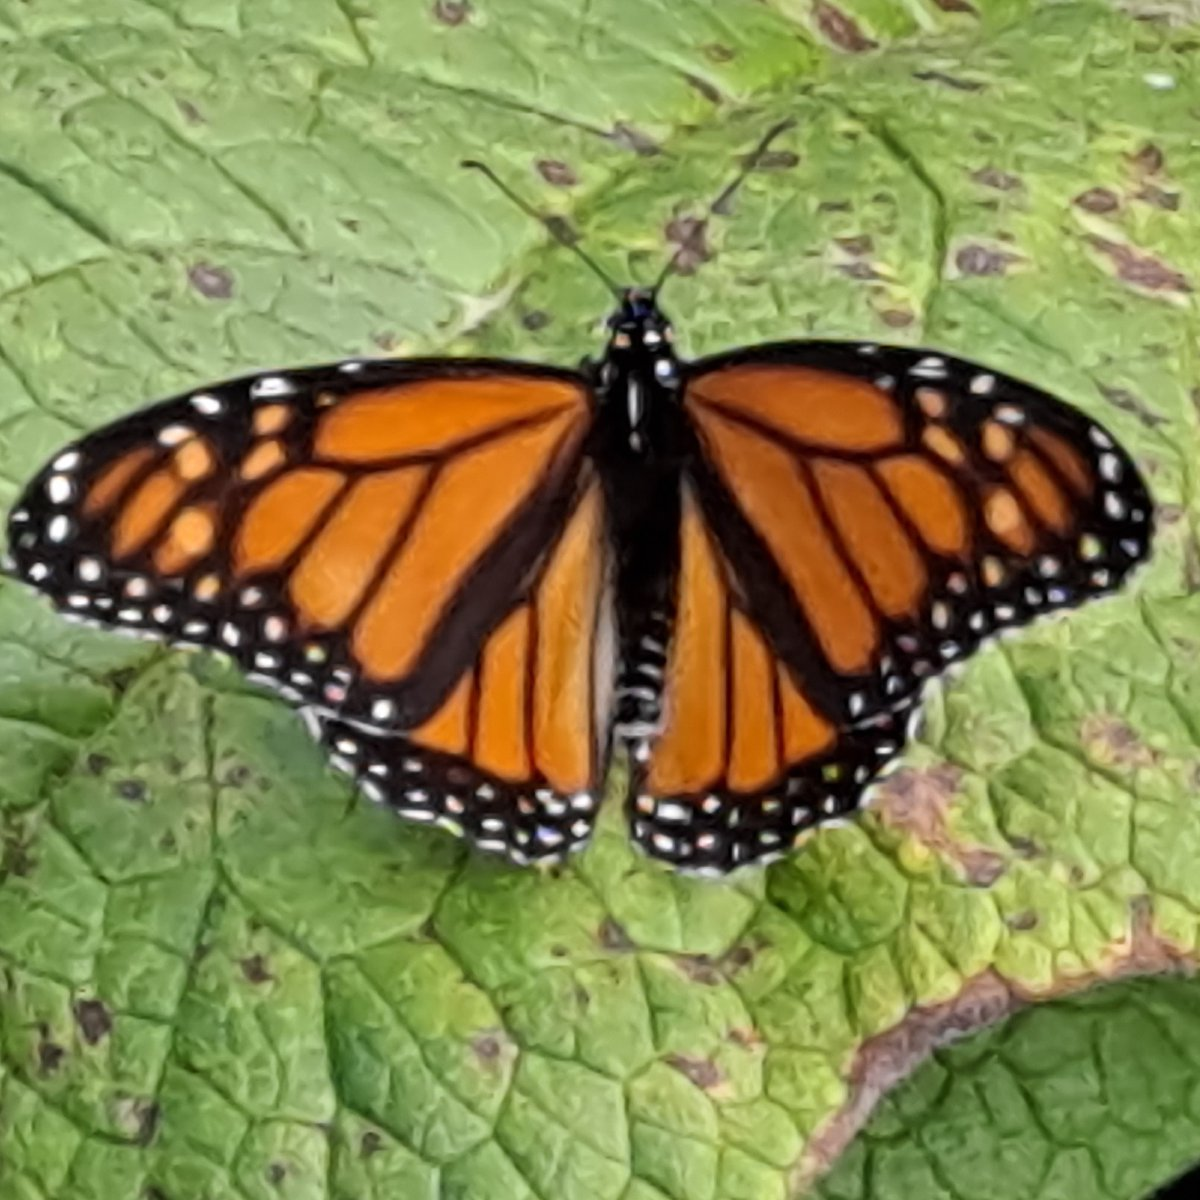 Leaves change & monarchs migrate. Love these sweet bright flyers. #monarch #Butterflies https://t.co/nl0sTNHtMC